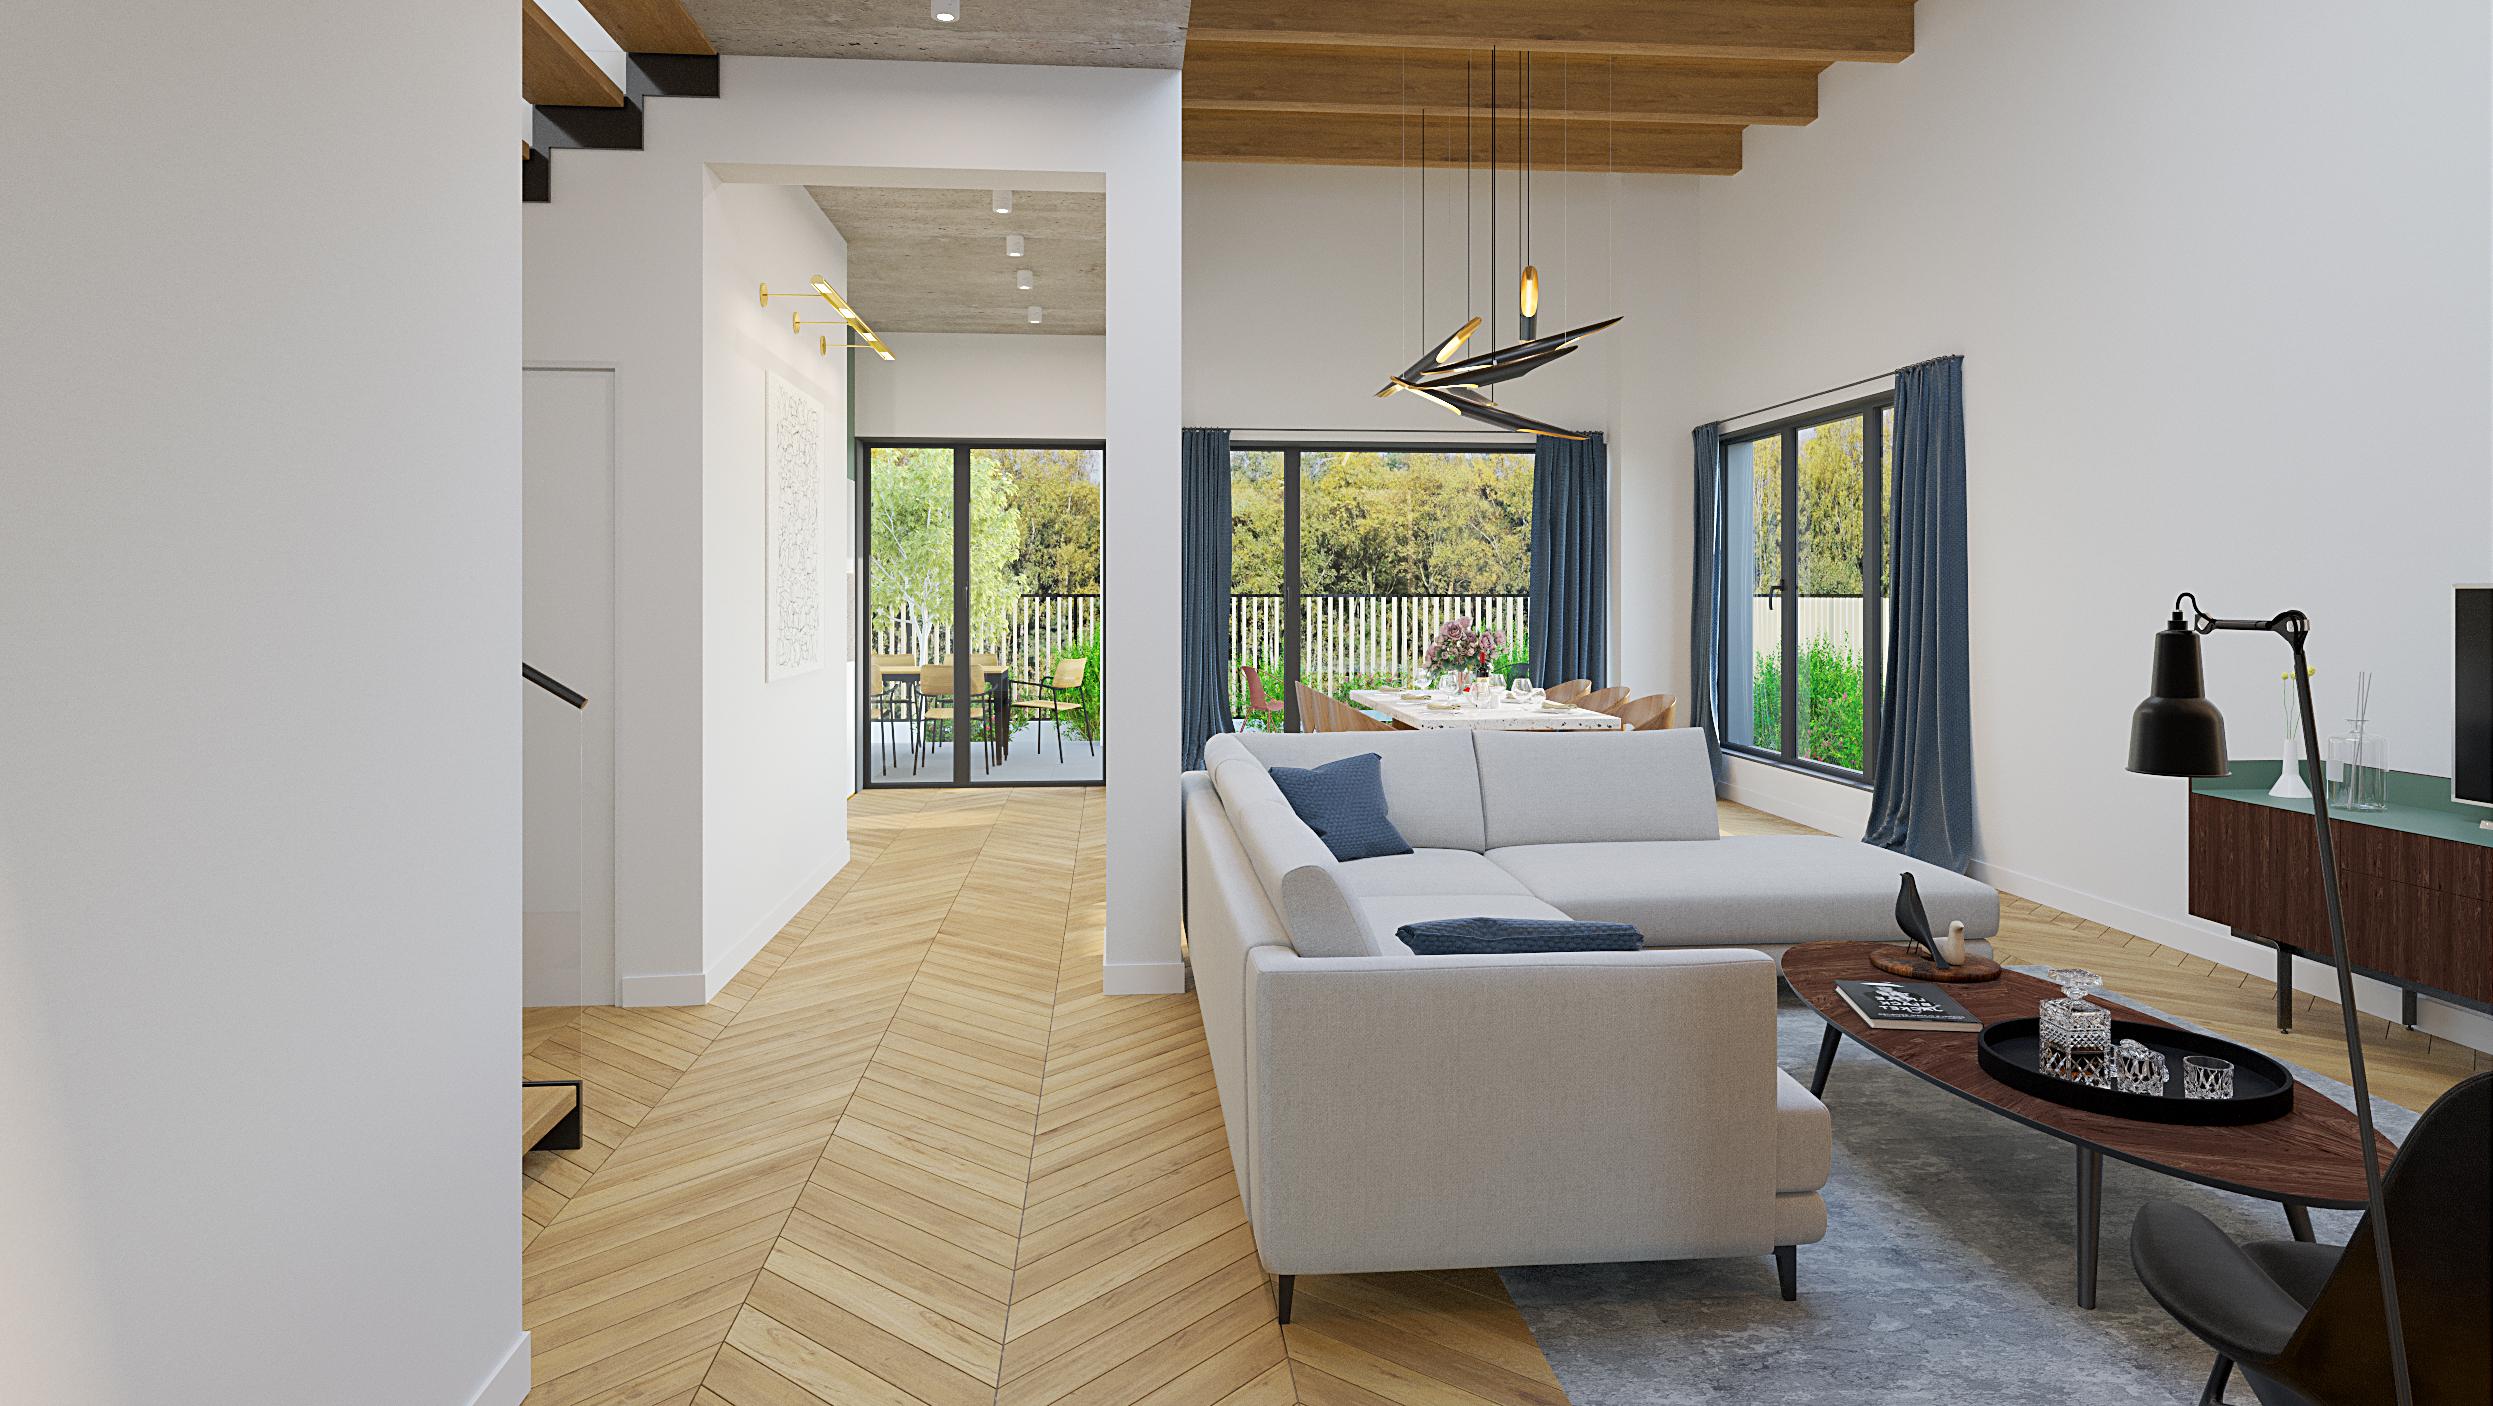 https://nbc-arhitect.ro/wp-content/uploads/2020/10/NBC-Arhitect-_-residential-_-Grand-Home-Residence-_-Romania_11.jpg